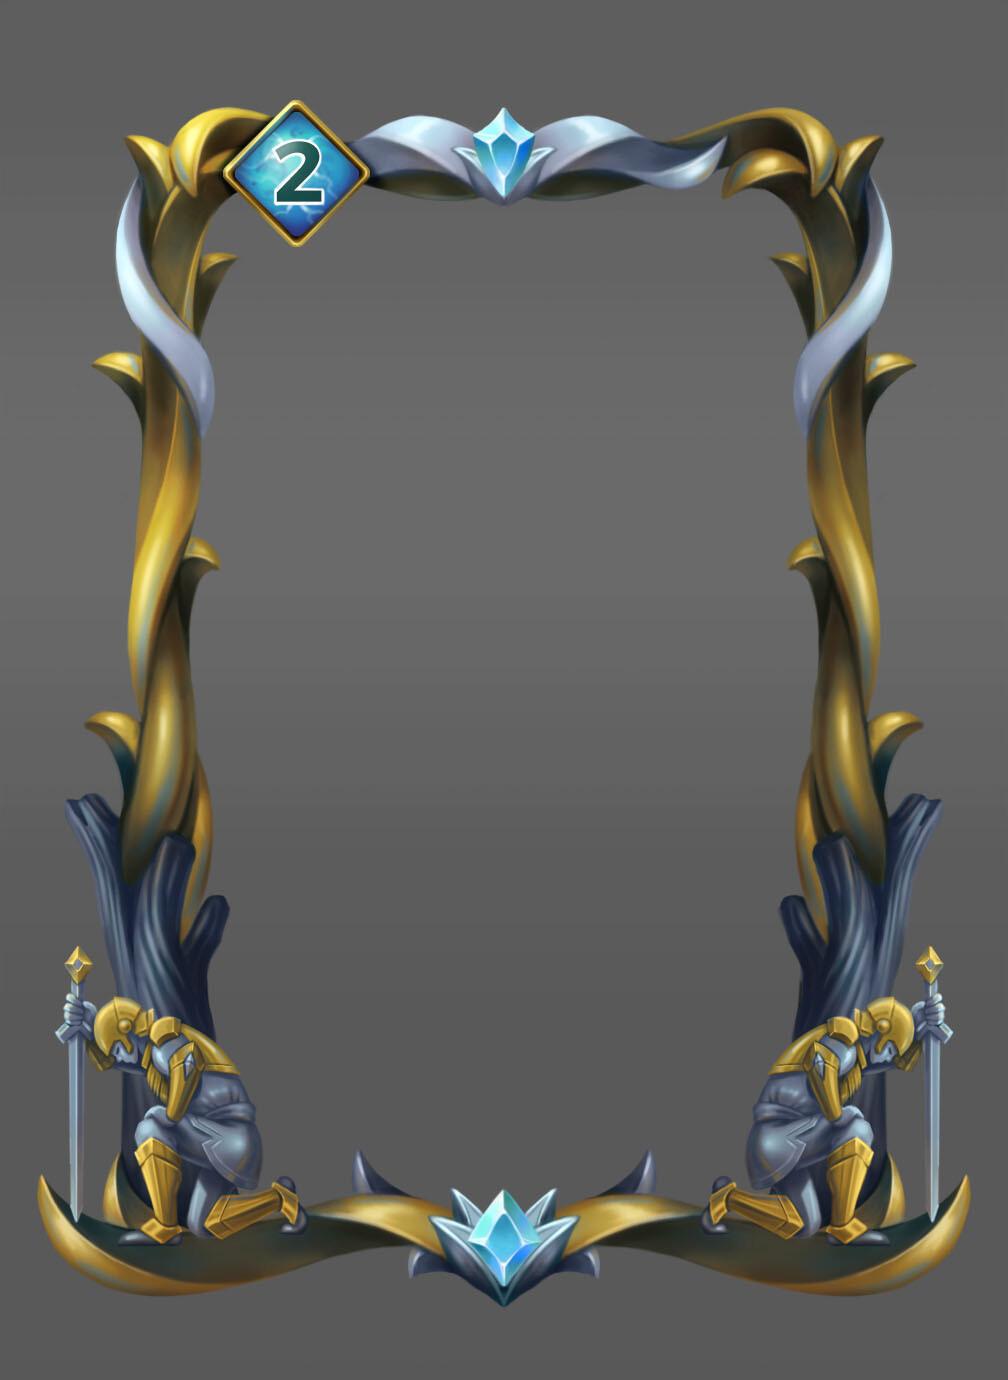 Narges jafari loadingframe ranks season2 gold final